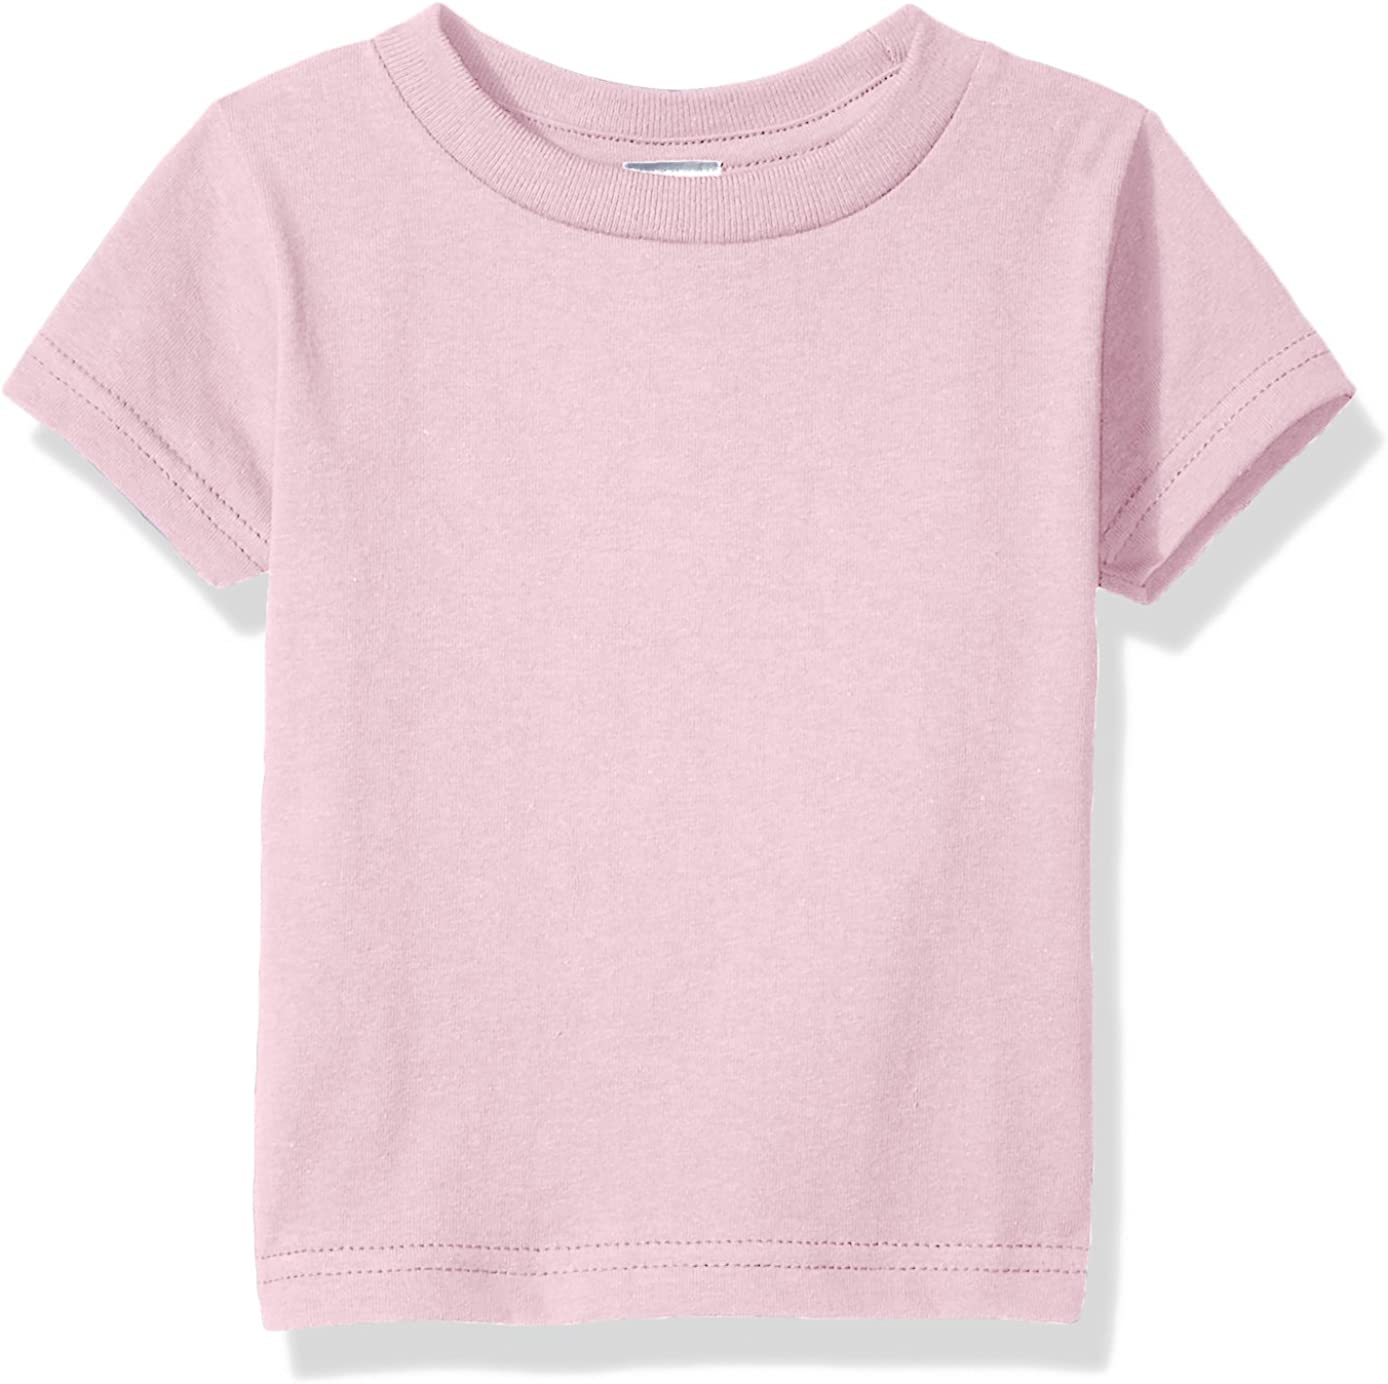 Clementine Baby-Girls Infant Soft Cotton Jersey Tees Short Sleeve Crewneck T-Shirt T-Shirt